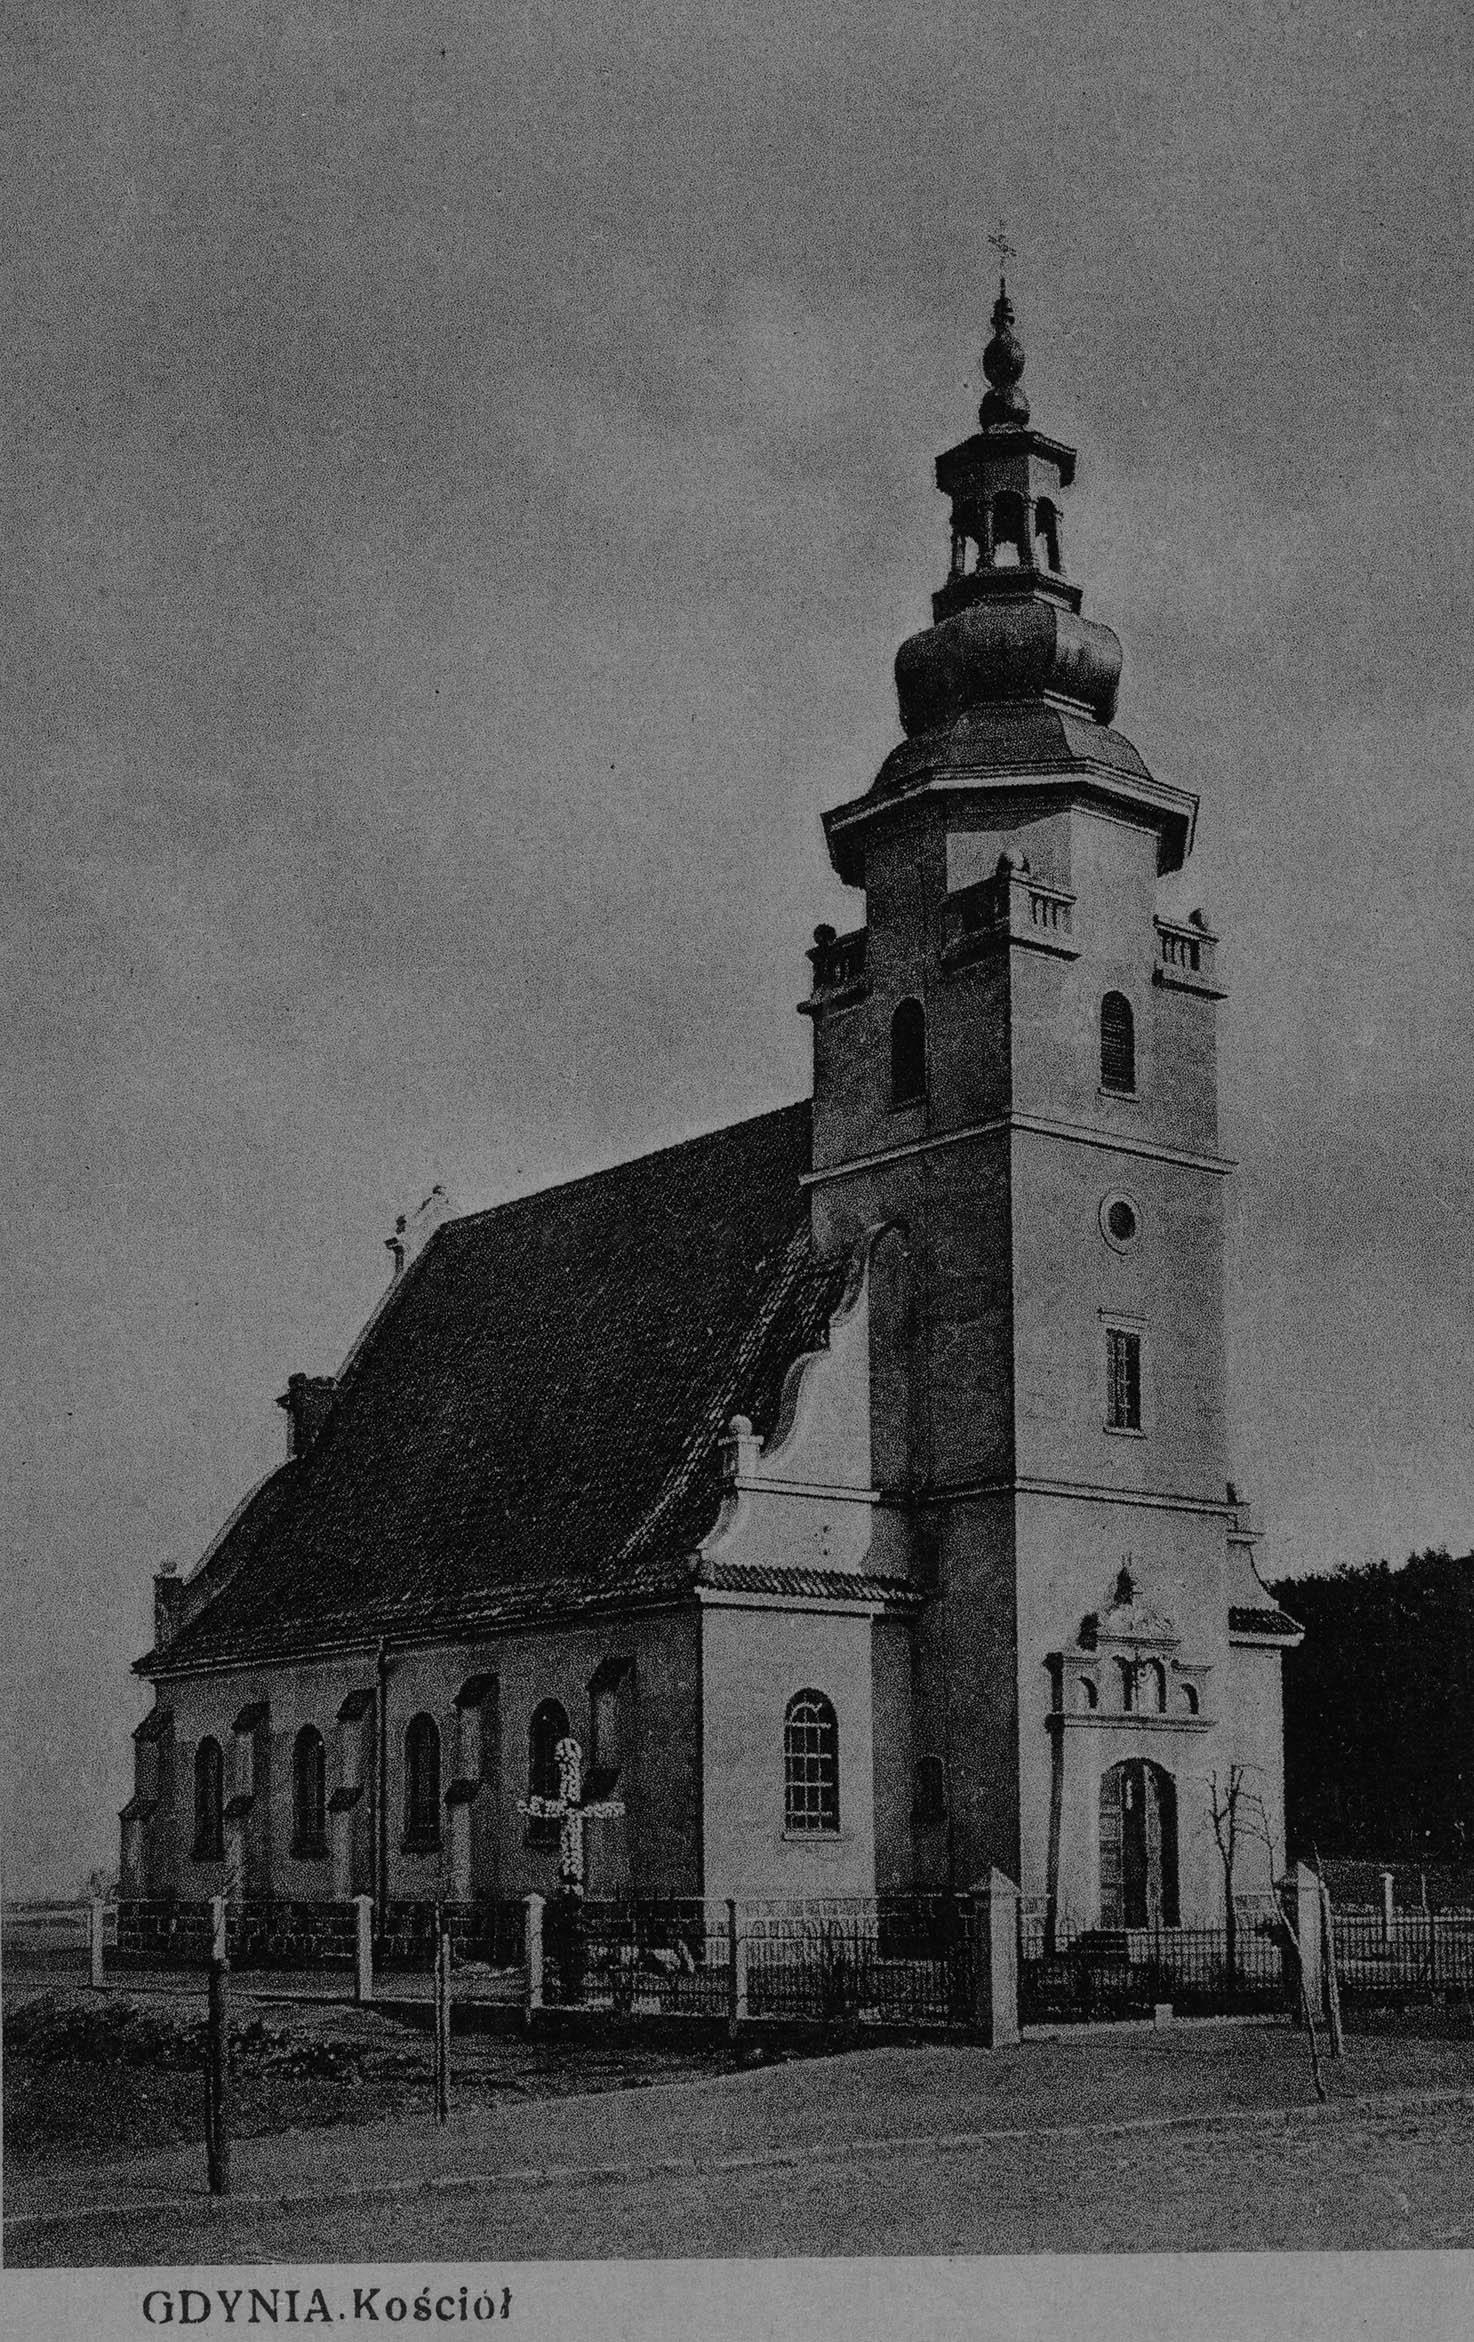 Ulica Świętojańska - Kościół NMP Królowej Polski